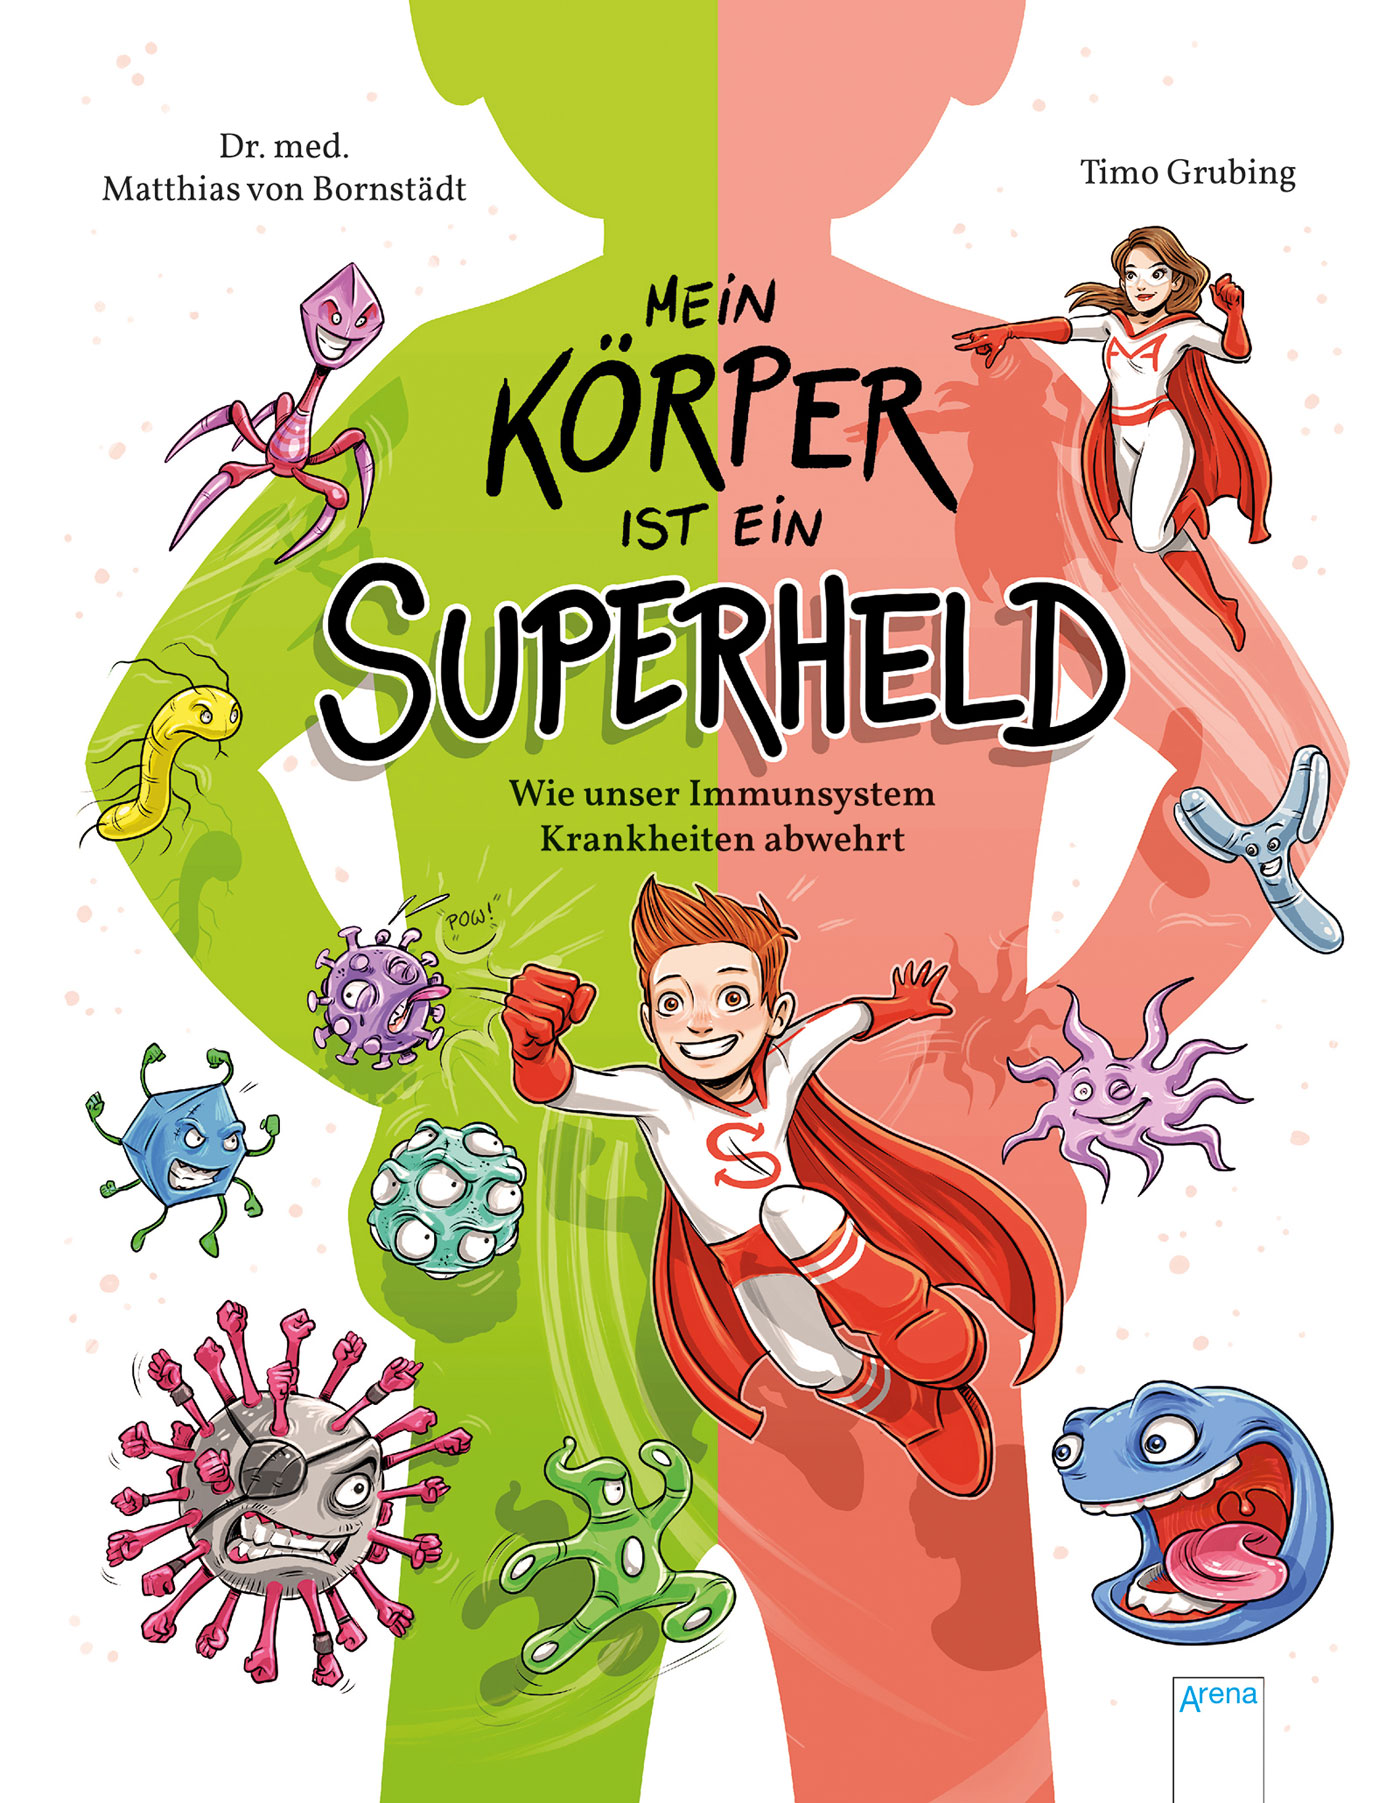 Kinderbuch-Tipp: Kindersachbuch über das Immunsystem // HIMBEER